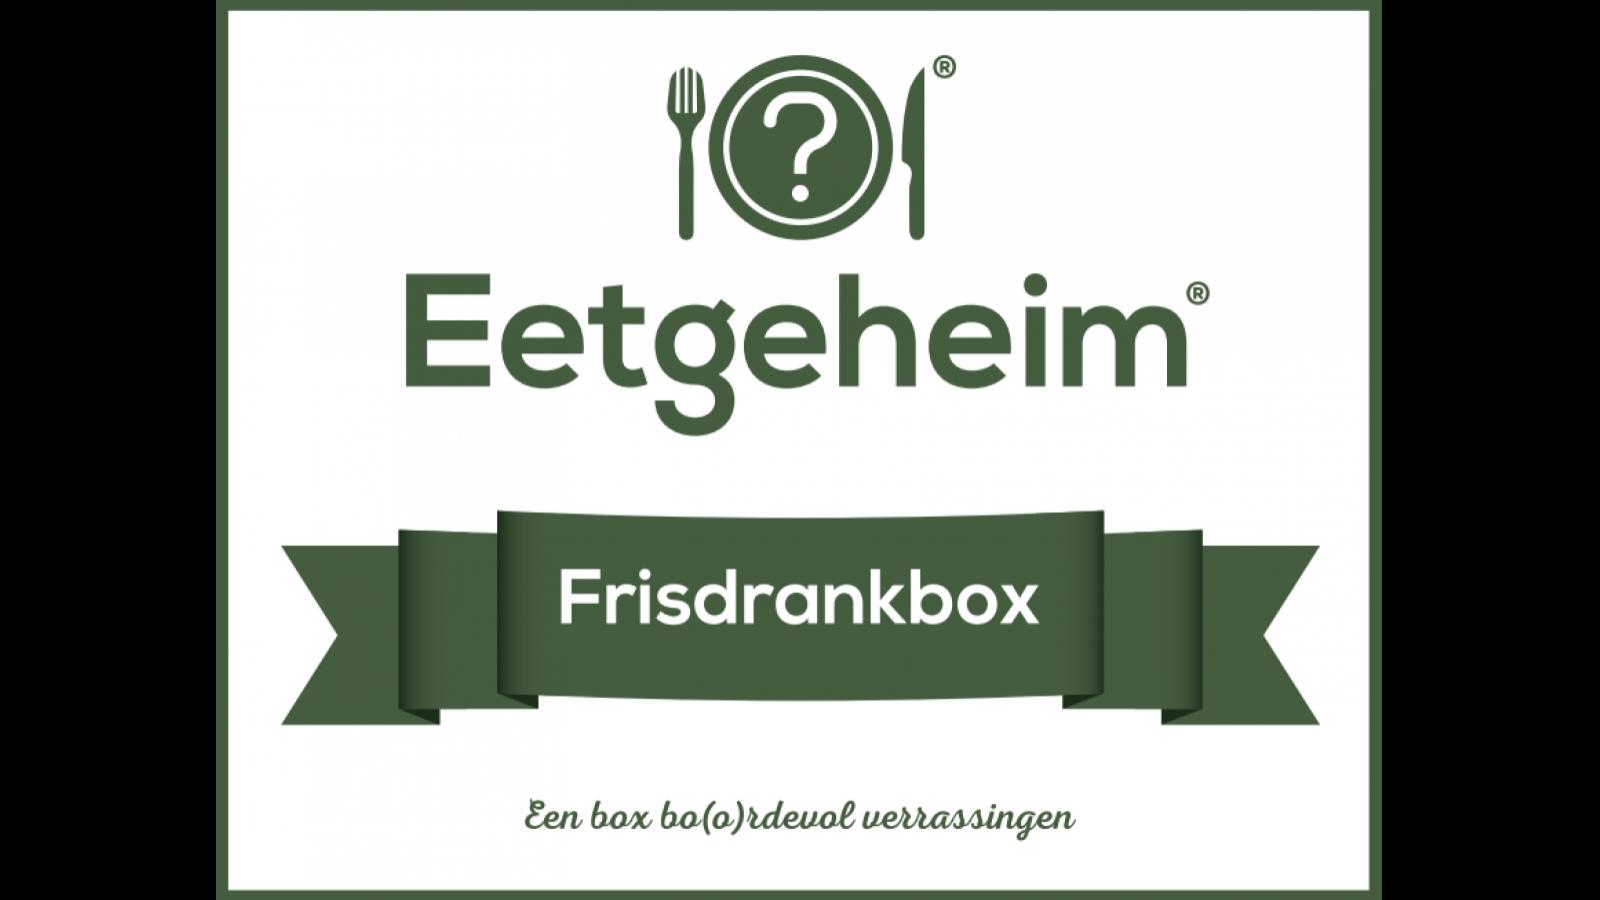 Frisdrank pakket Eetgeheim